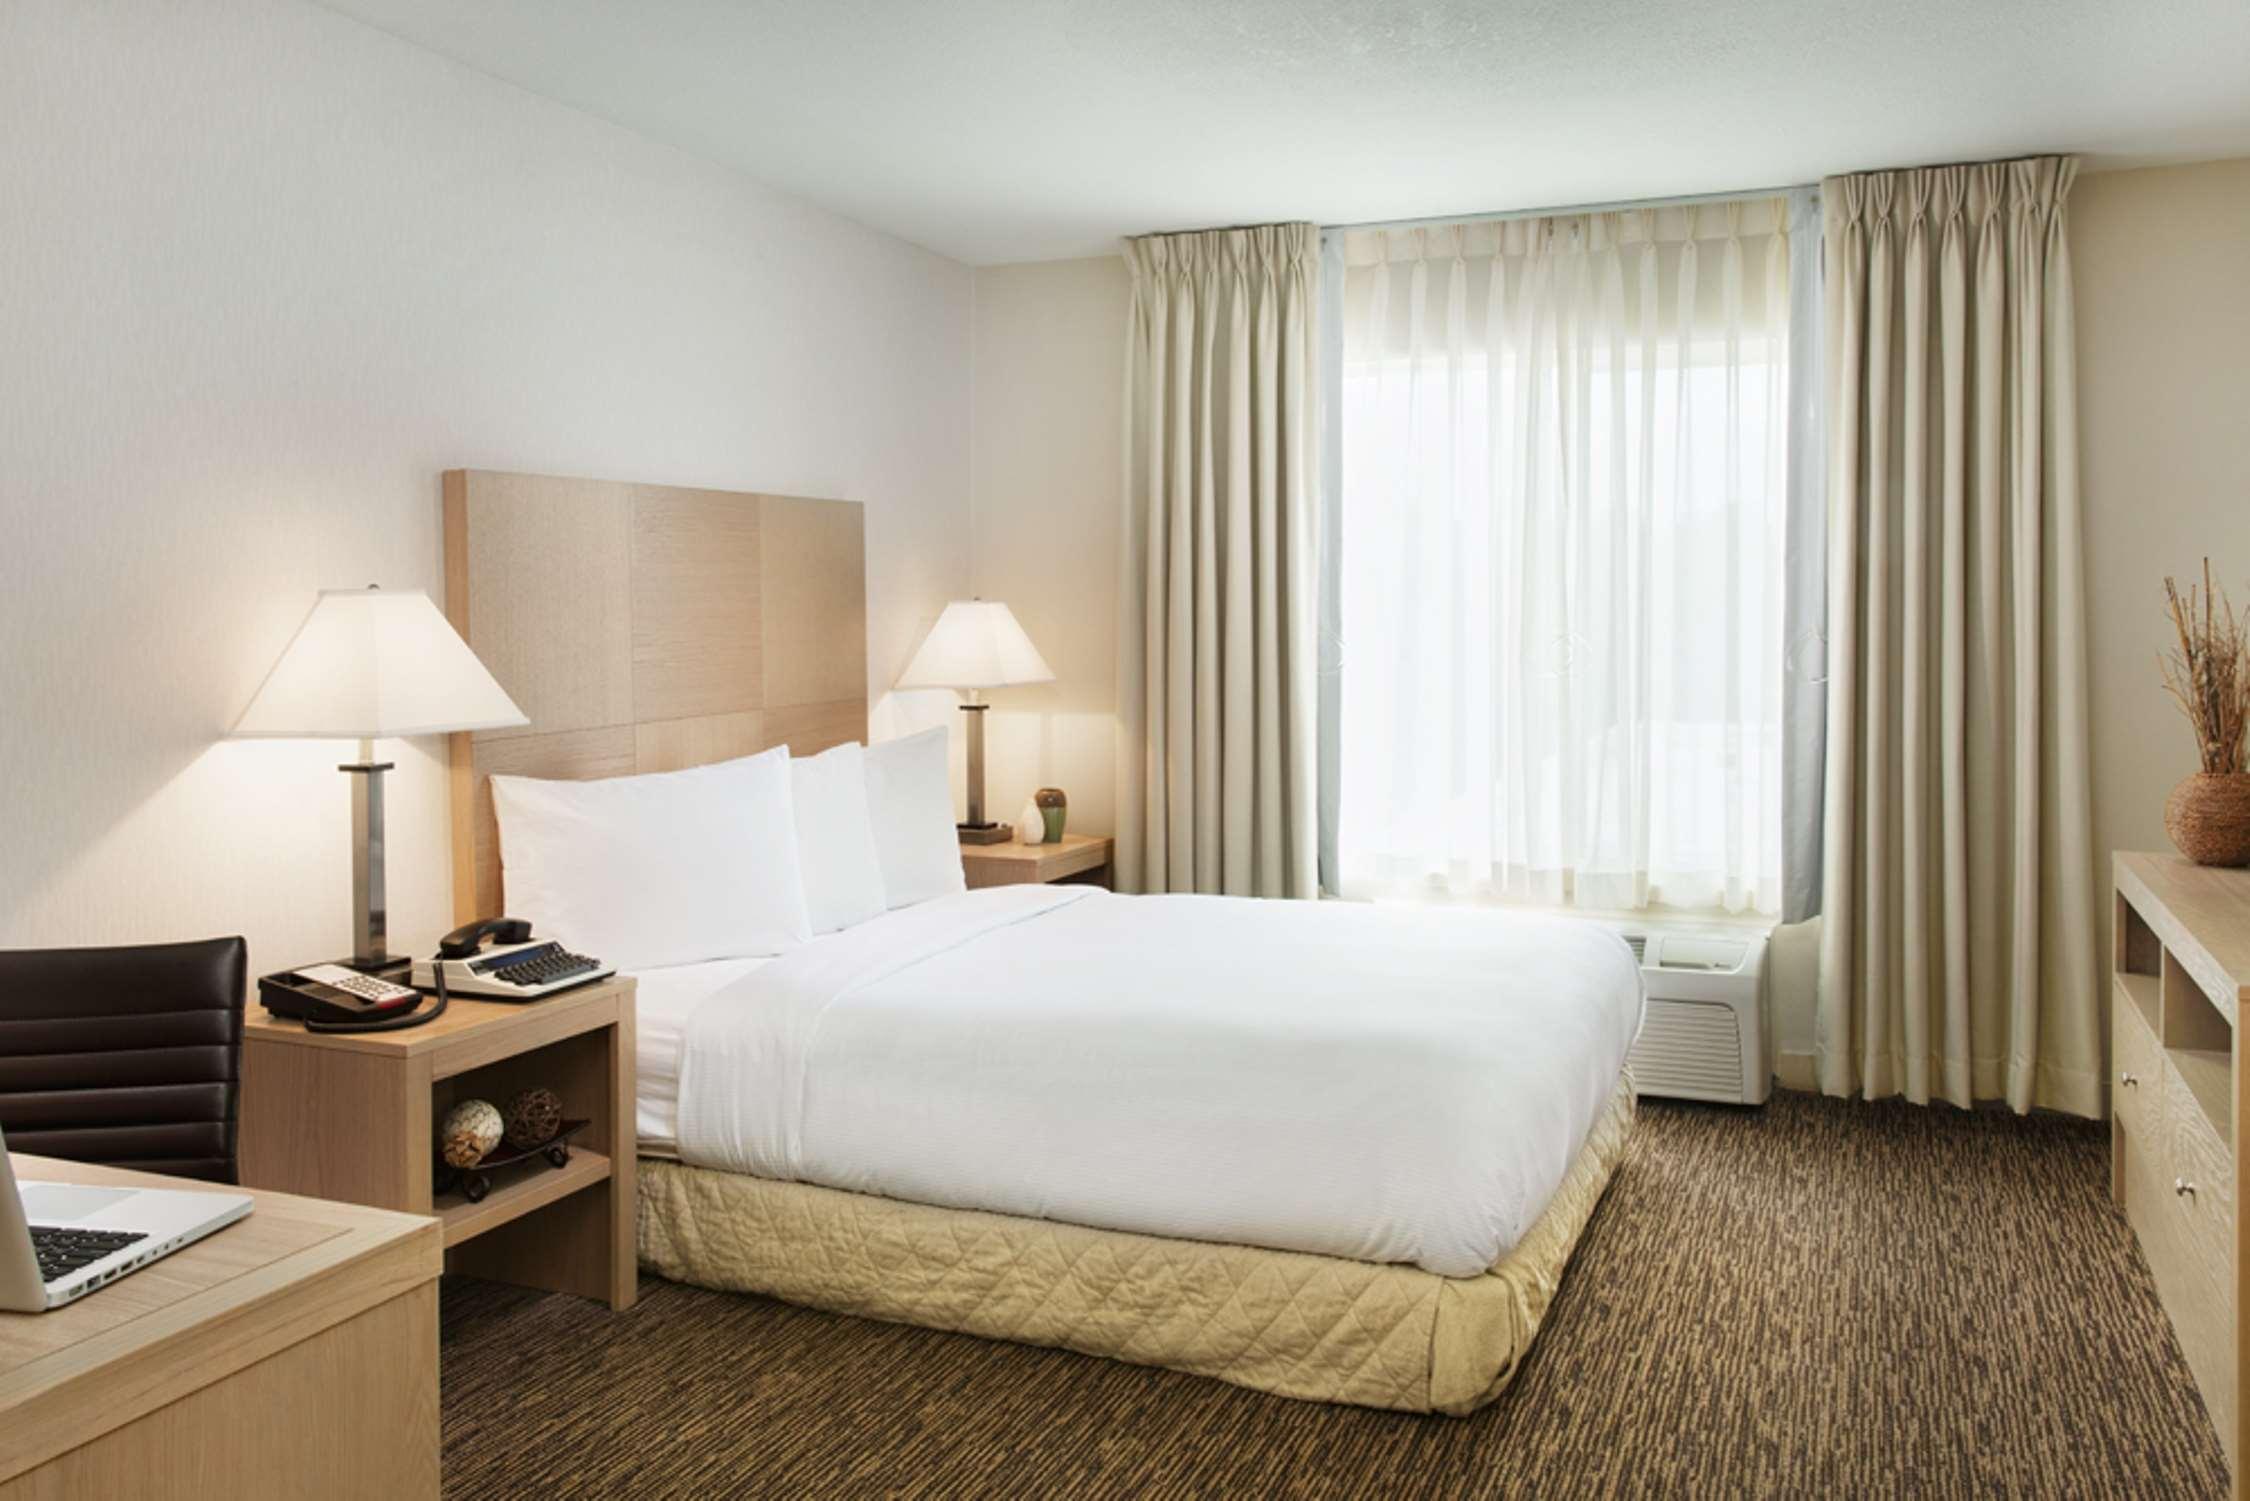 DoubleTree by Hilton Hotel Vancouver, Washington image 8